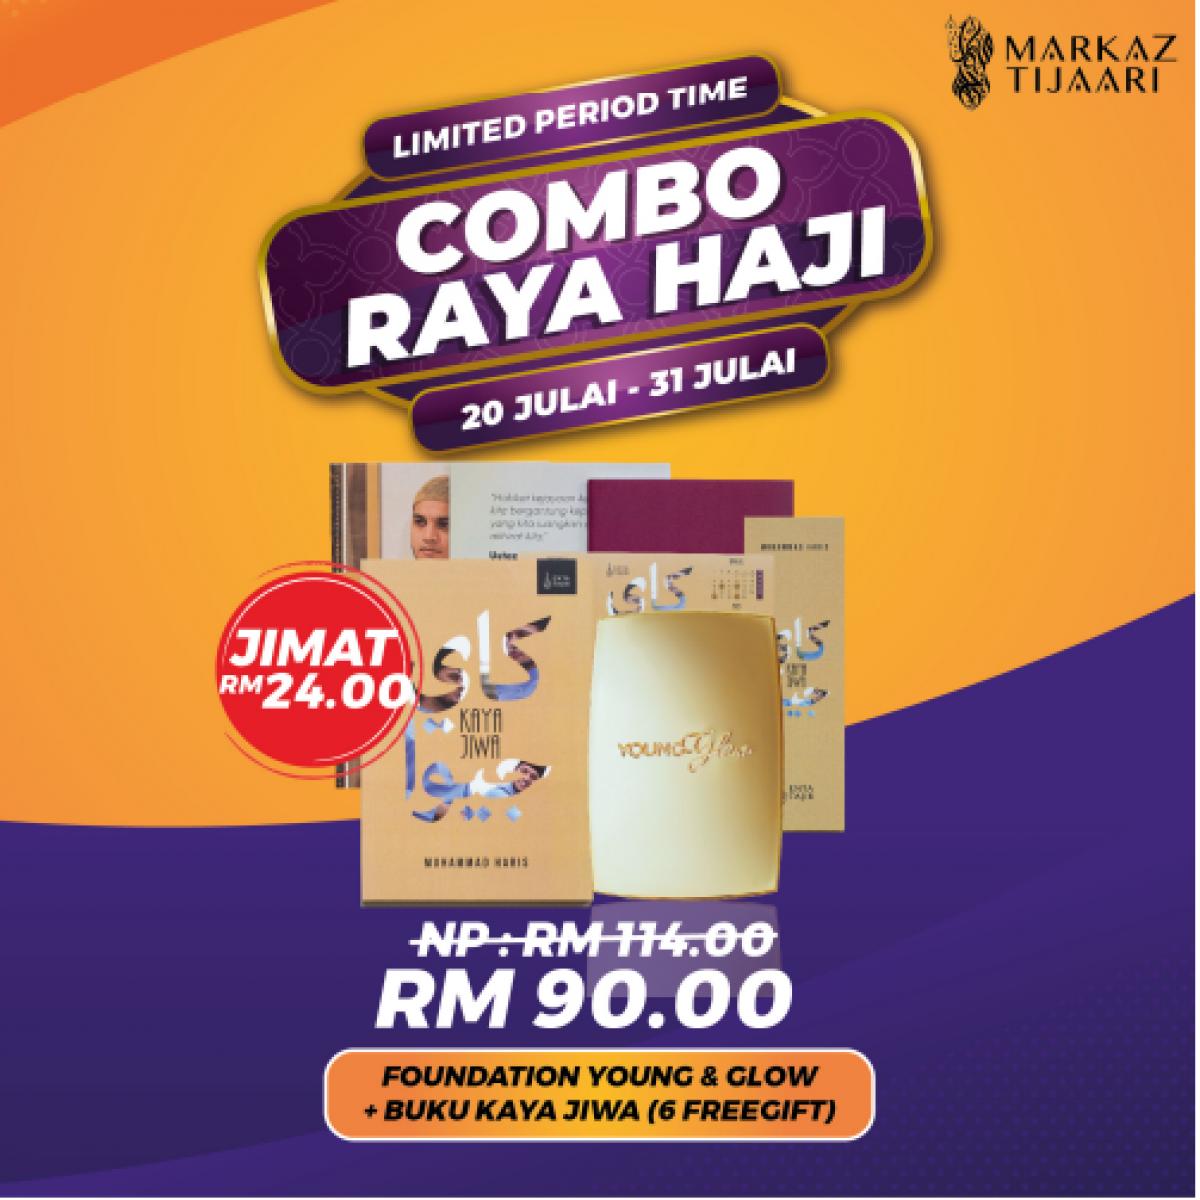 Foundation Young & Glow + Buku Kaya Jiwa Combo Raya Haji - MARKAZ TIJAARI